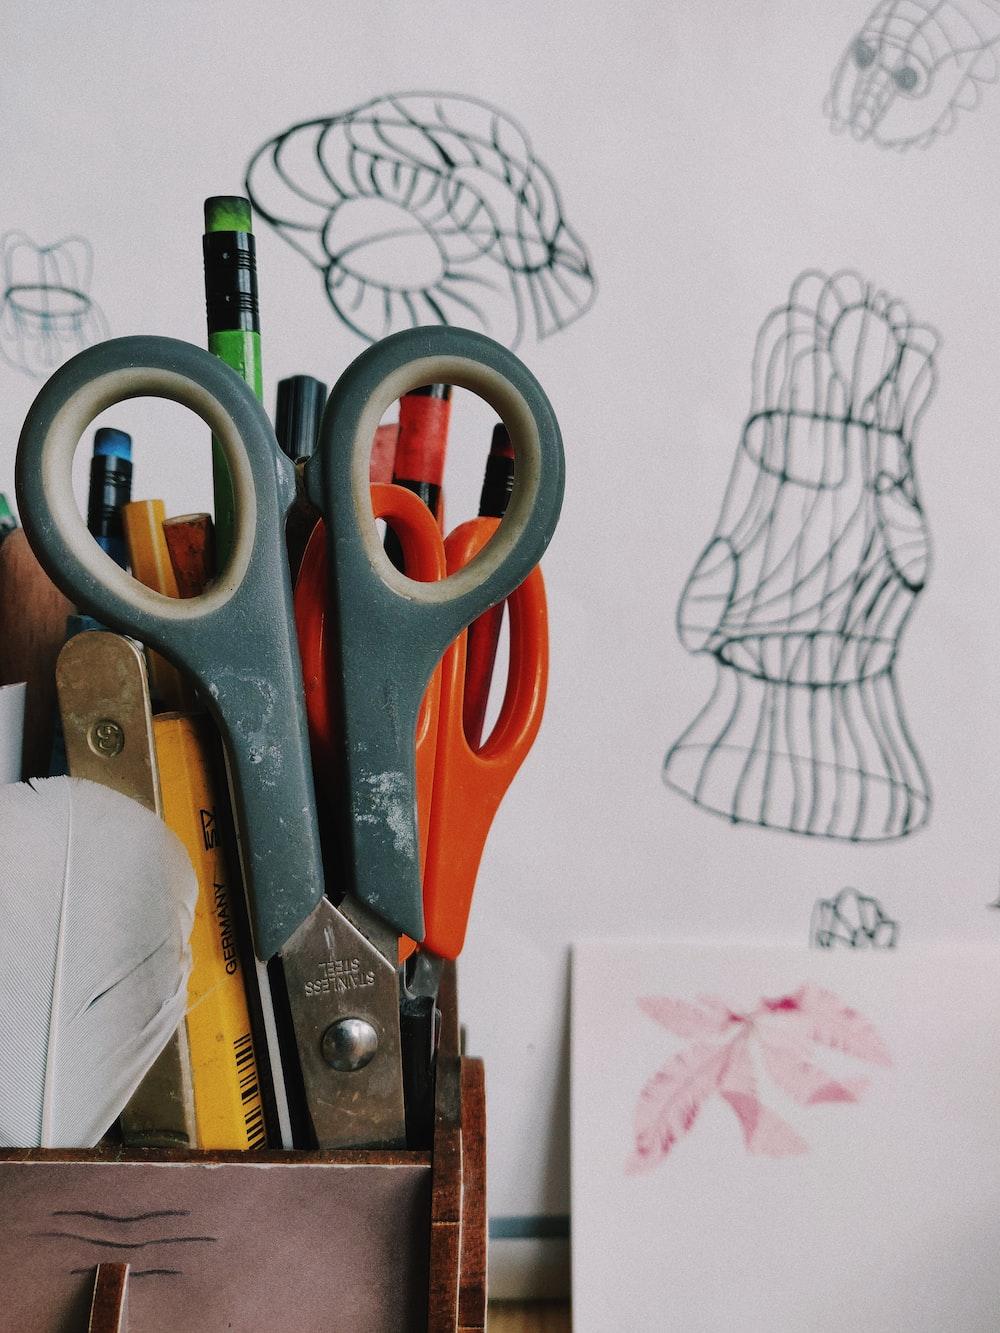 pen and scissors in vase